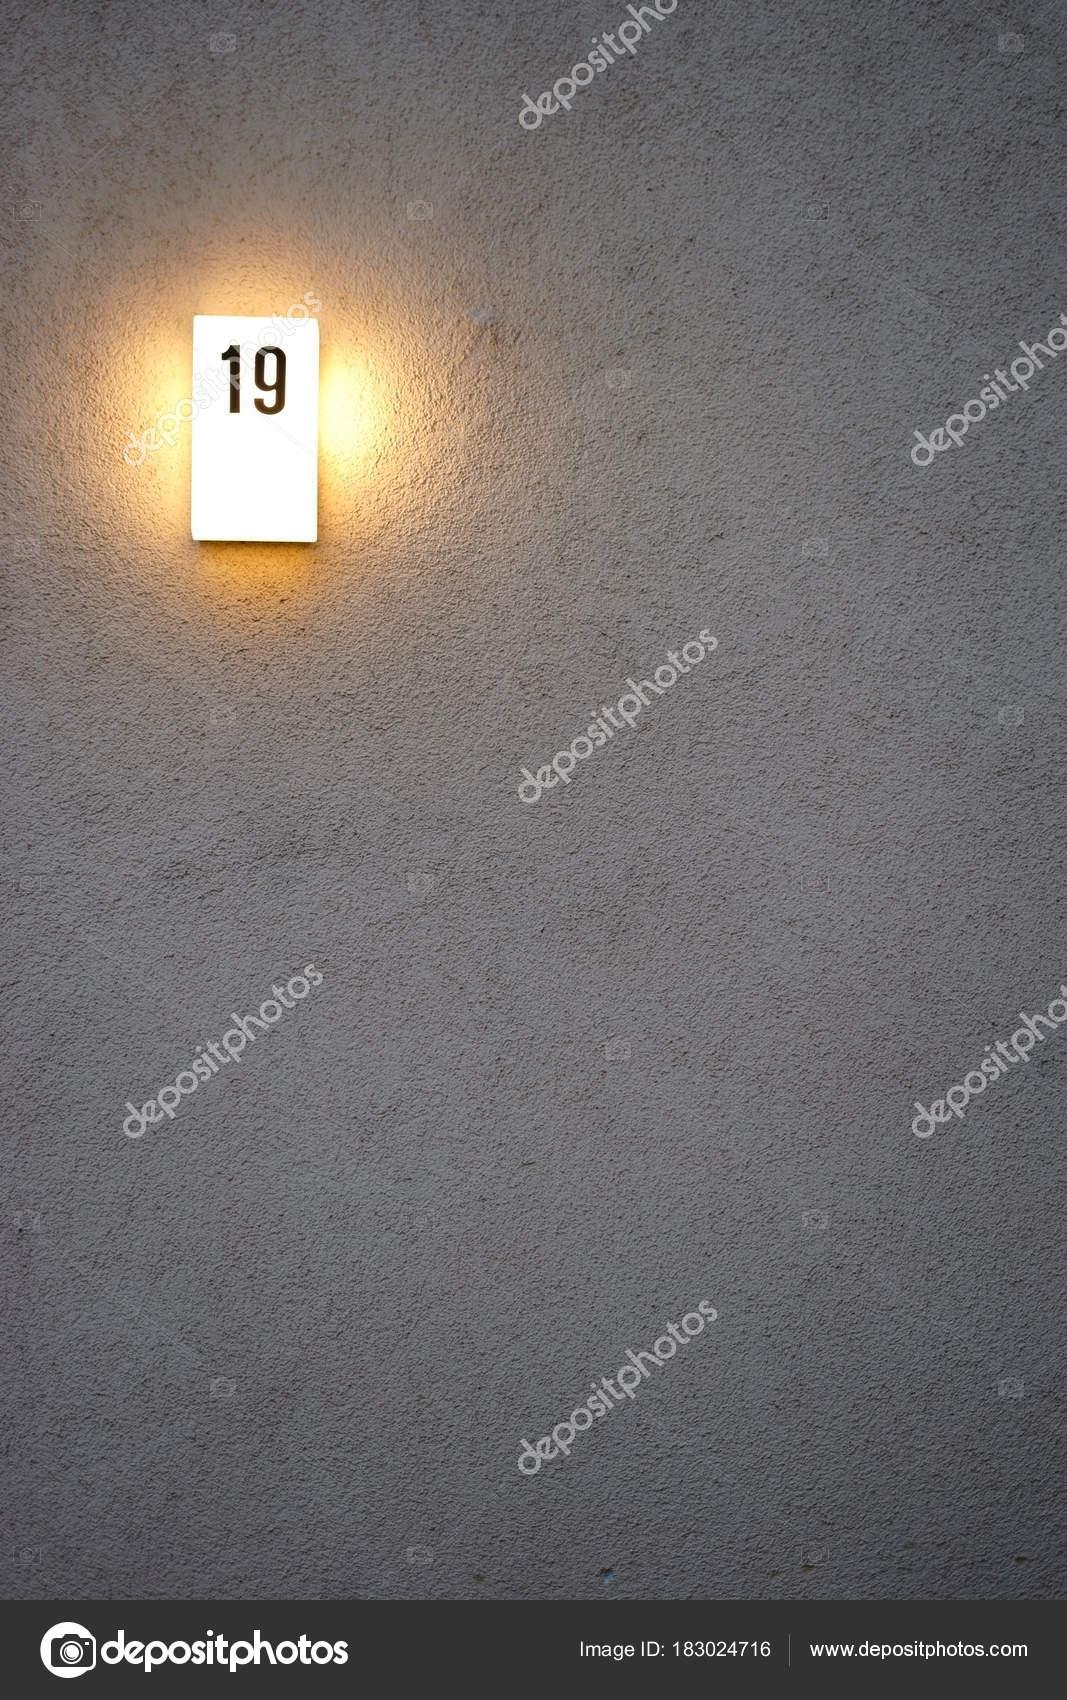 Huis Nummer Bord Avond Verlicht Close Van Een Verlicht Huisnummer ...